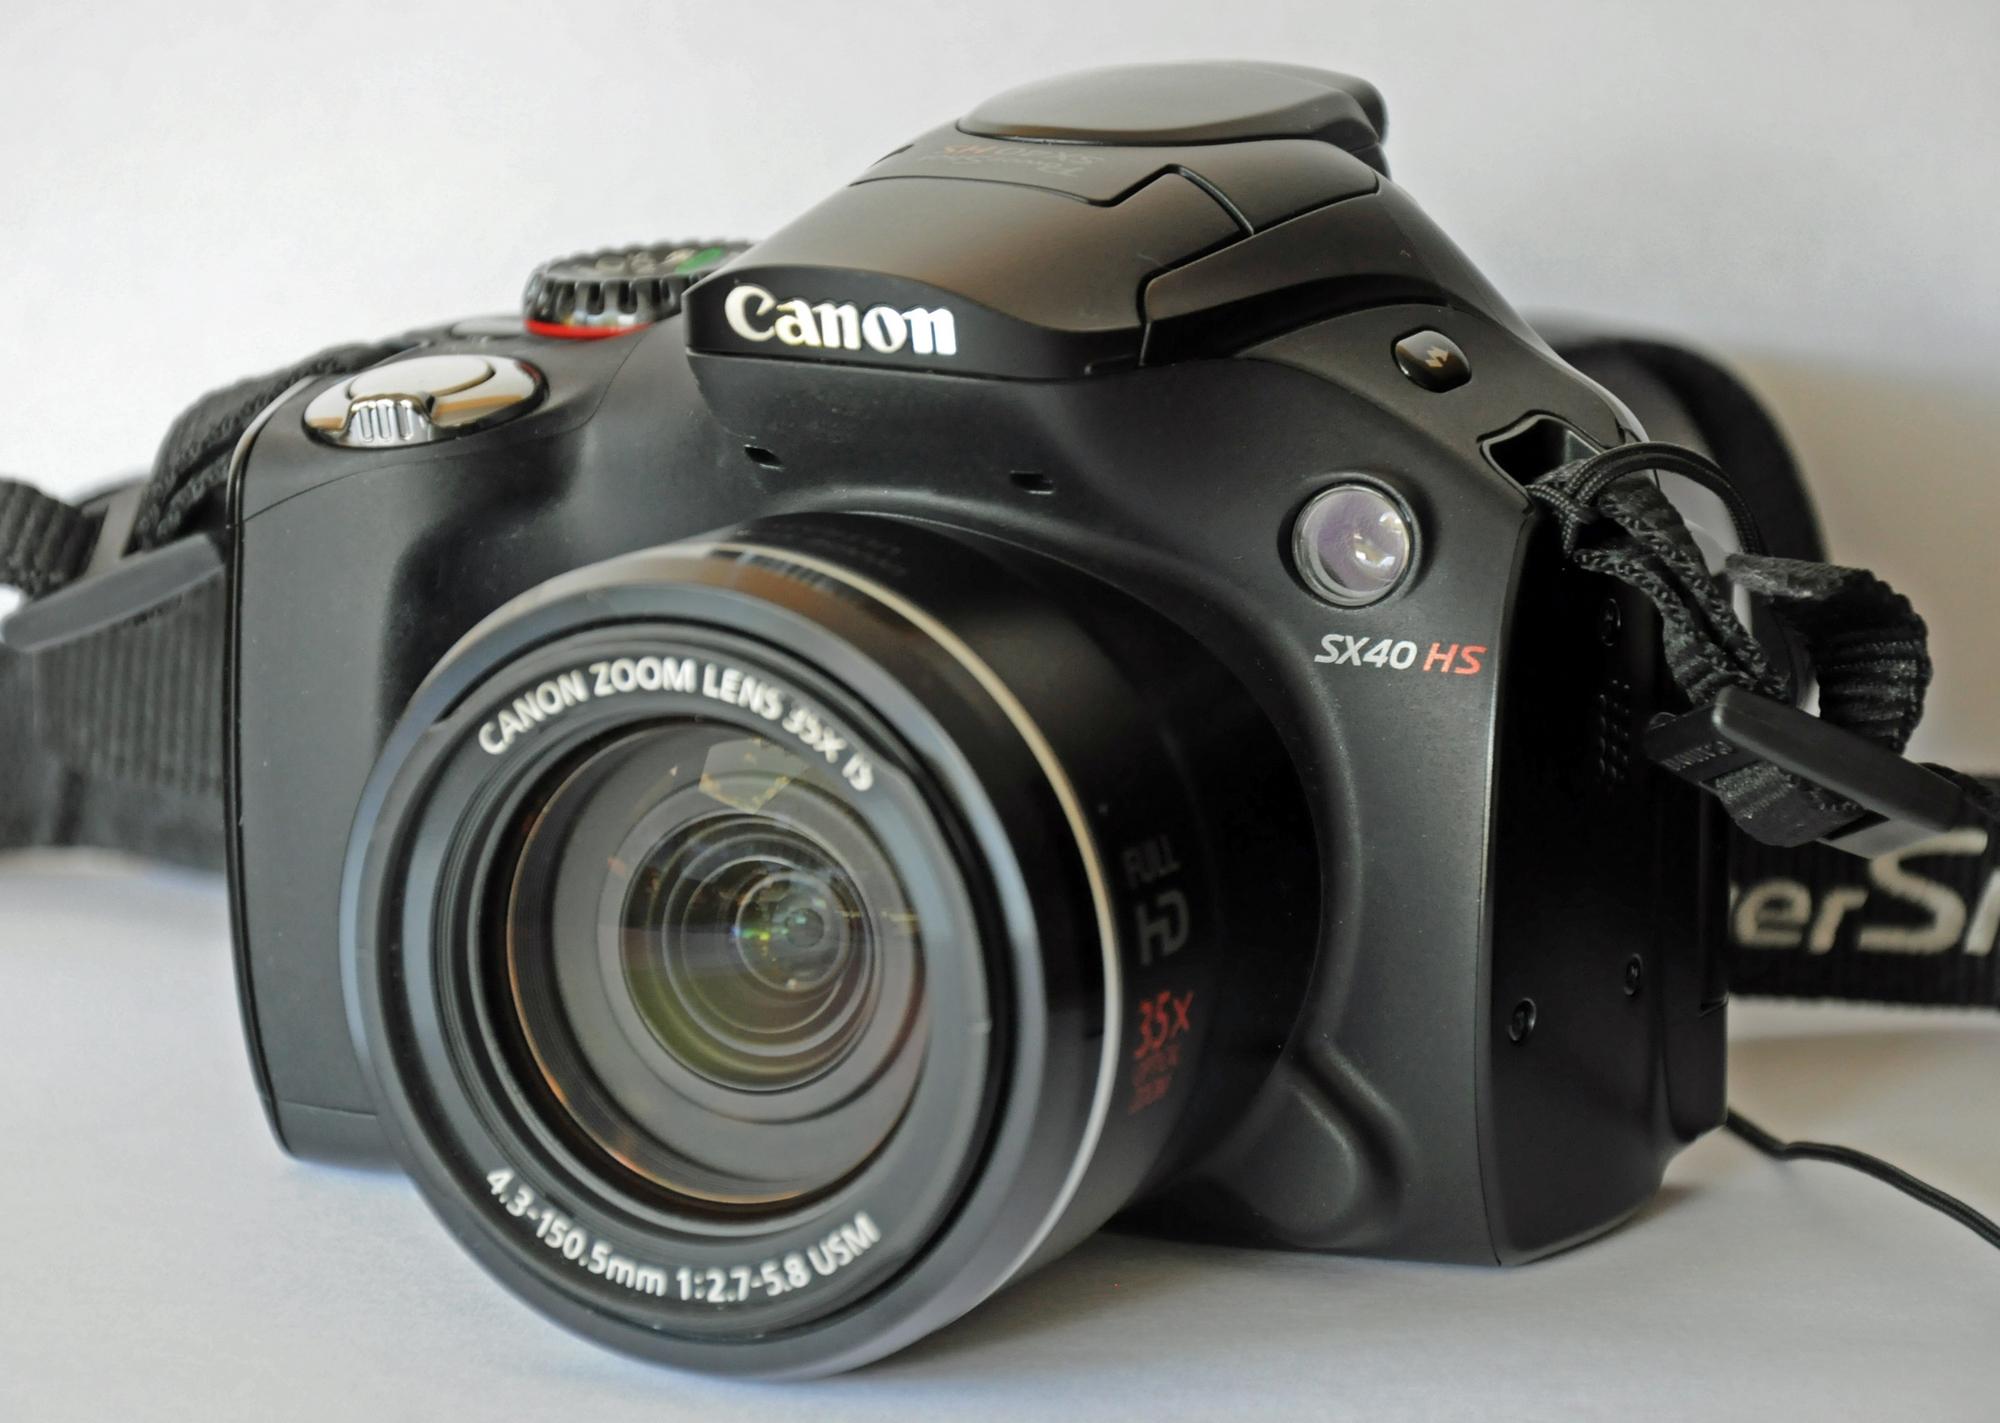 file canon powershot sx40 hs jpg wikimedia commons